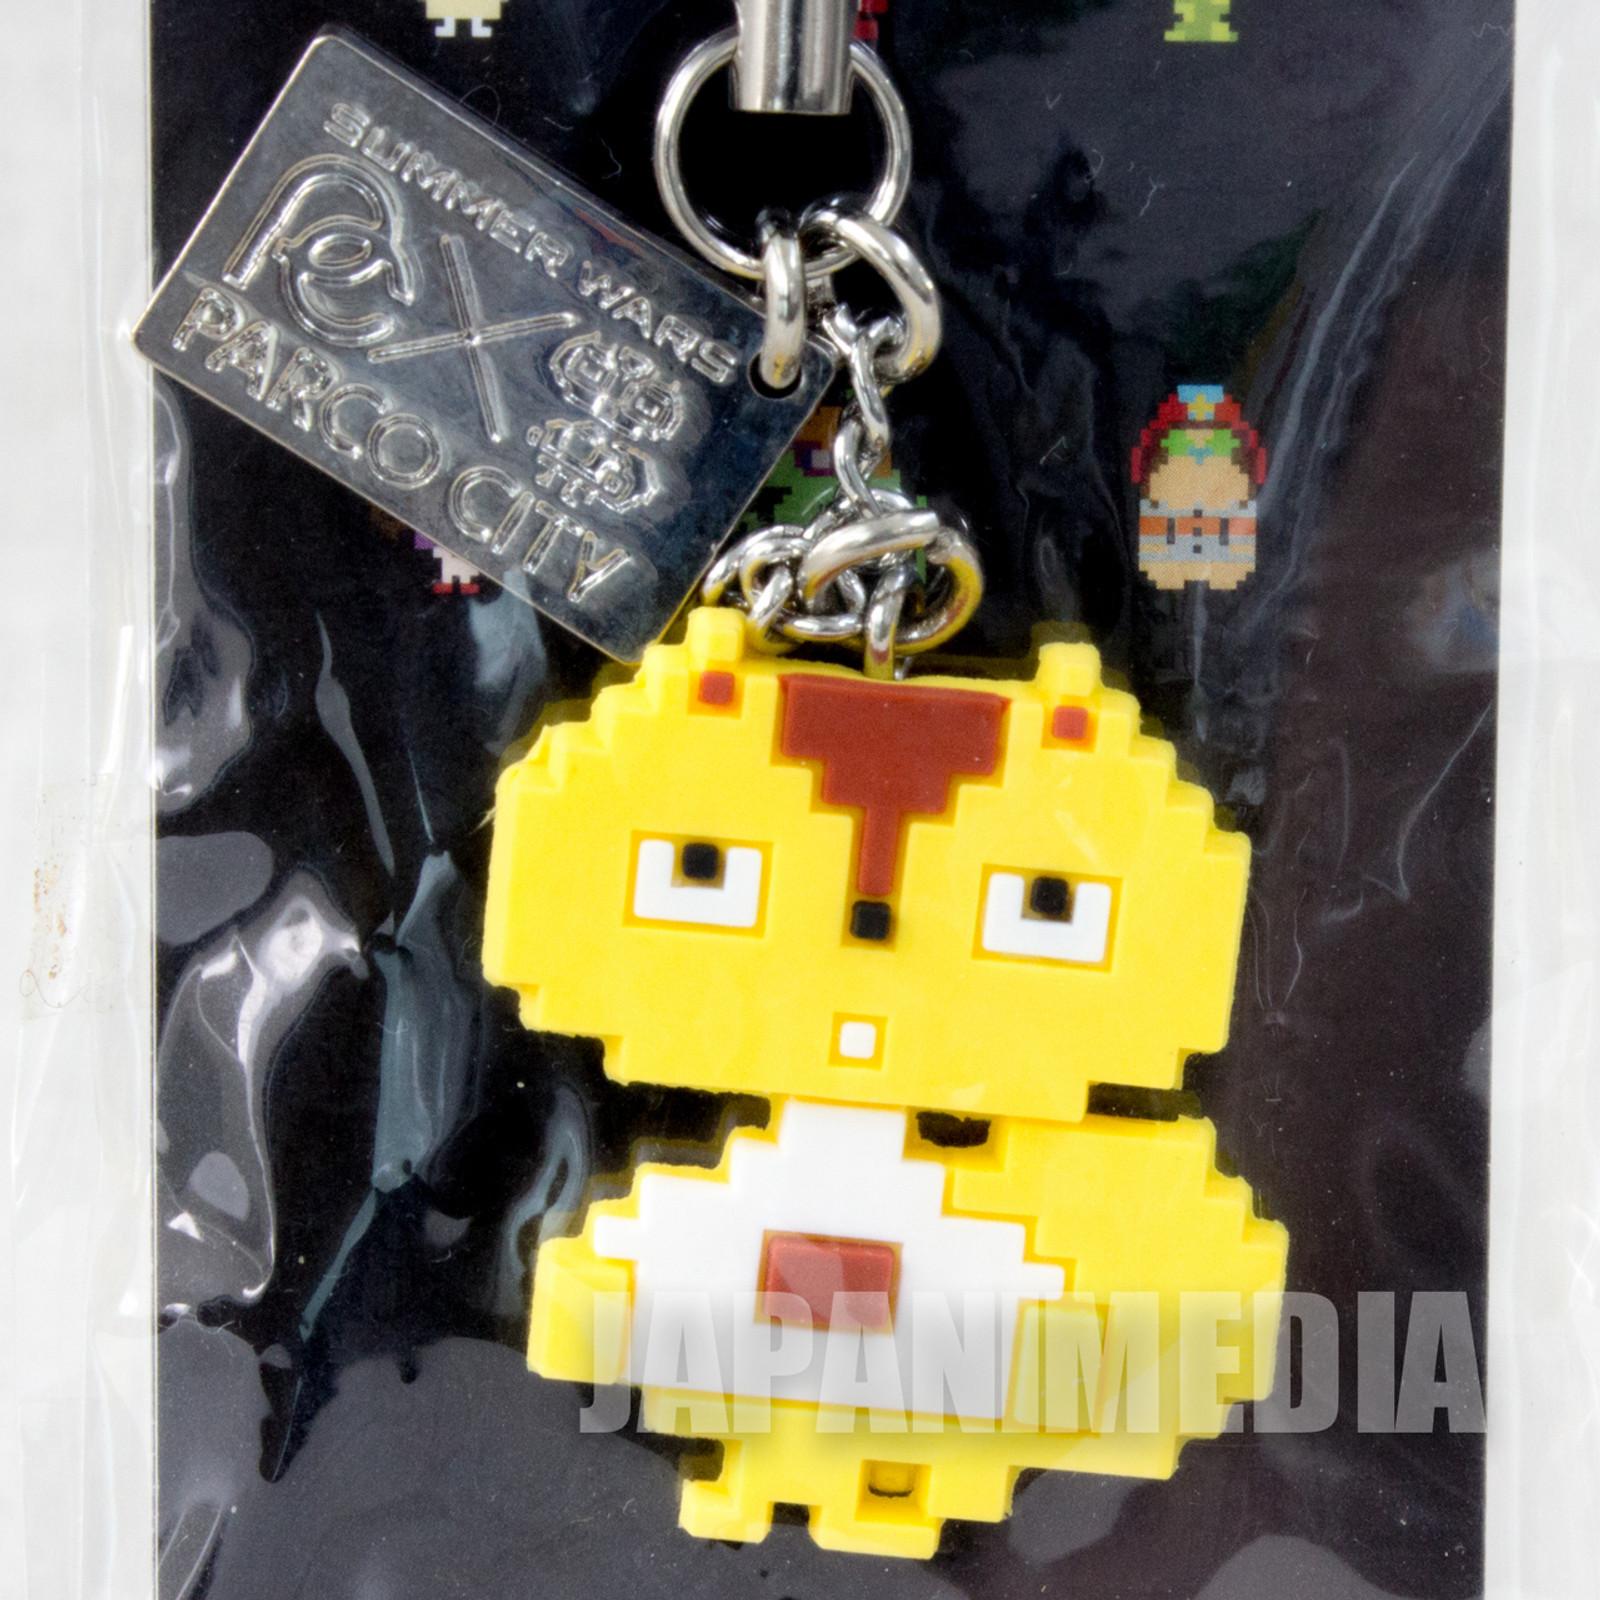 Summer Wars Provisional Kenji Mascot Strap Parco City JAPAN ANIME